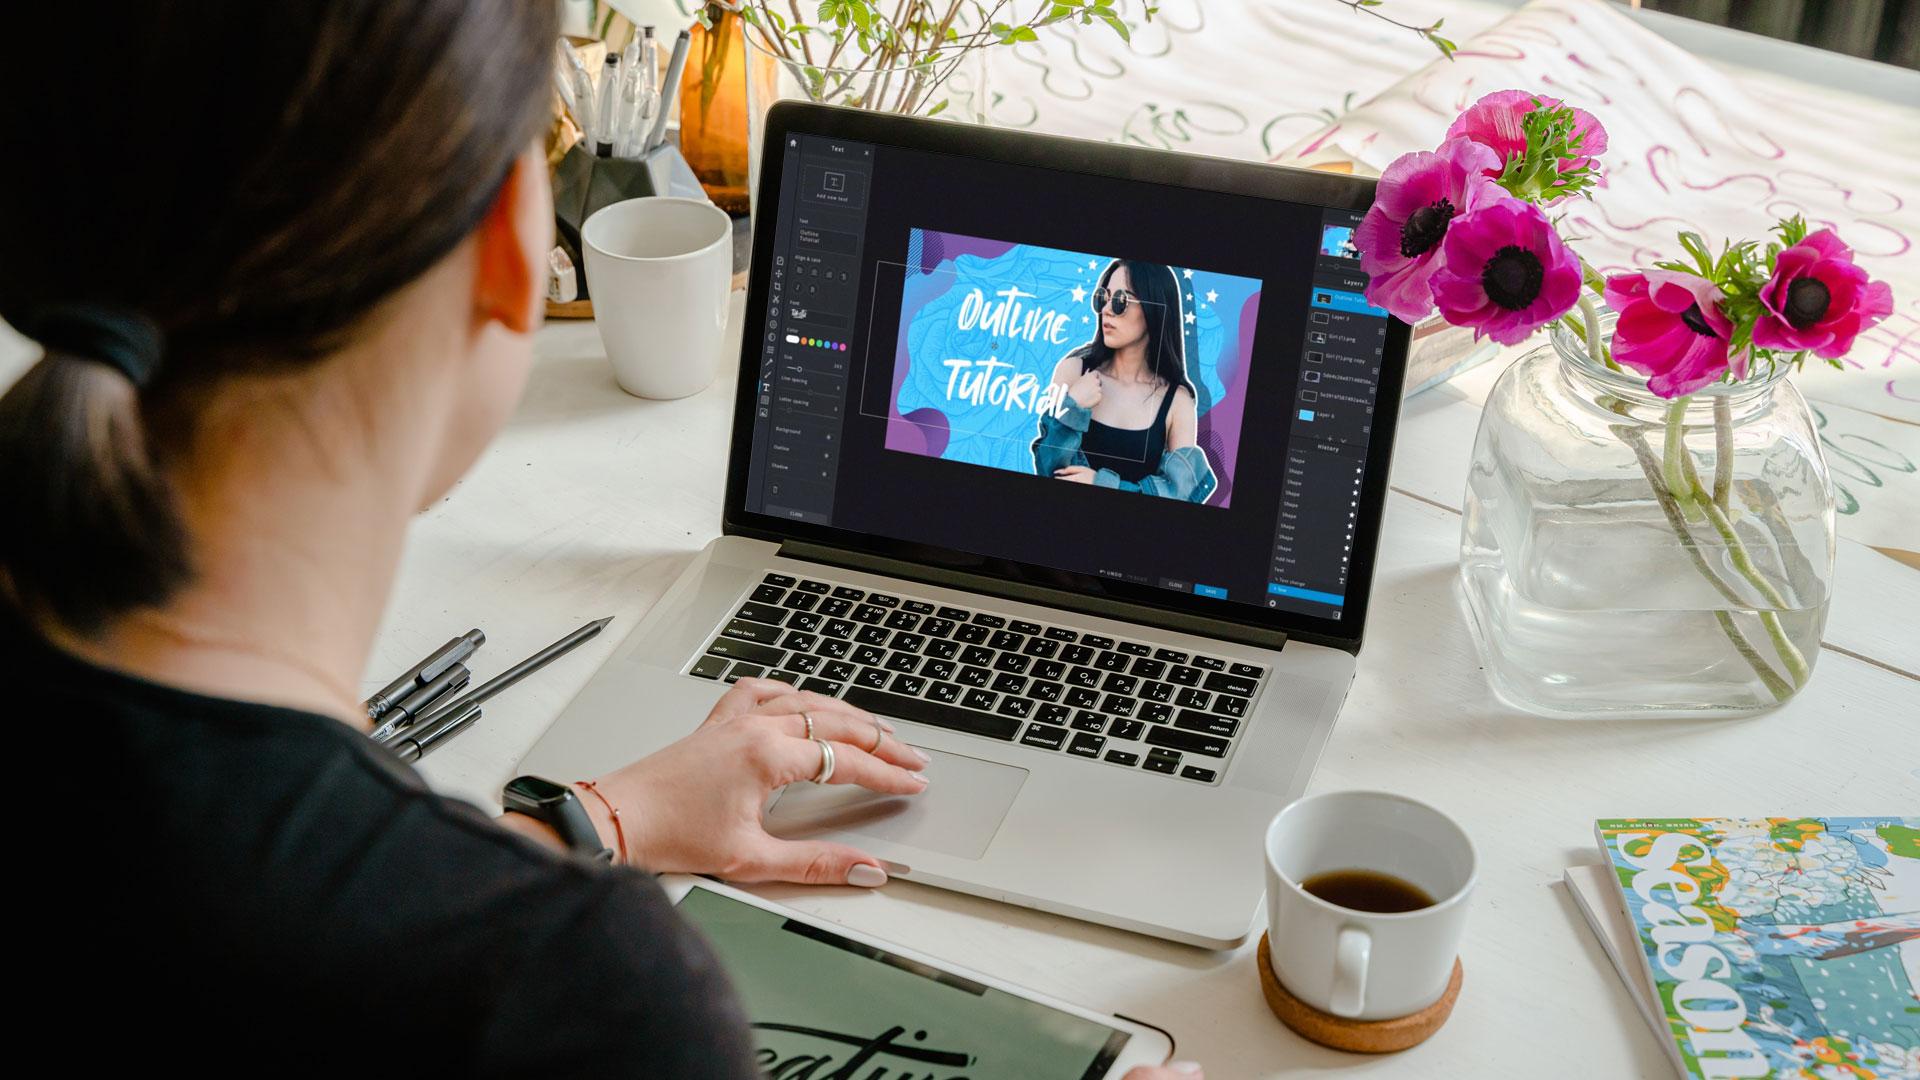 Best Laptop for Graphic Design